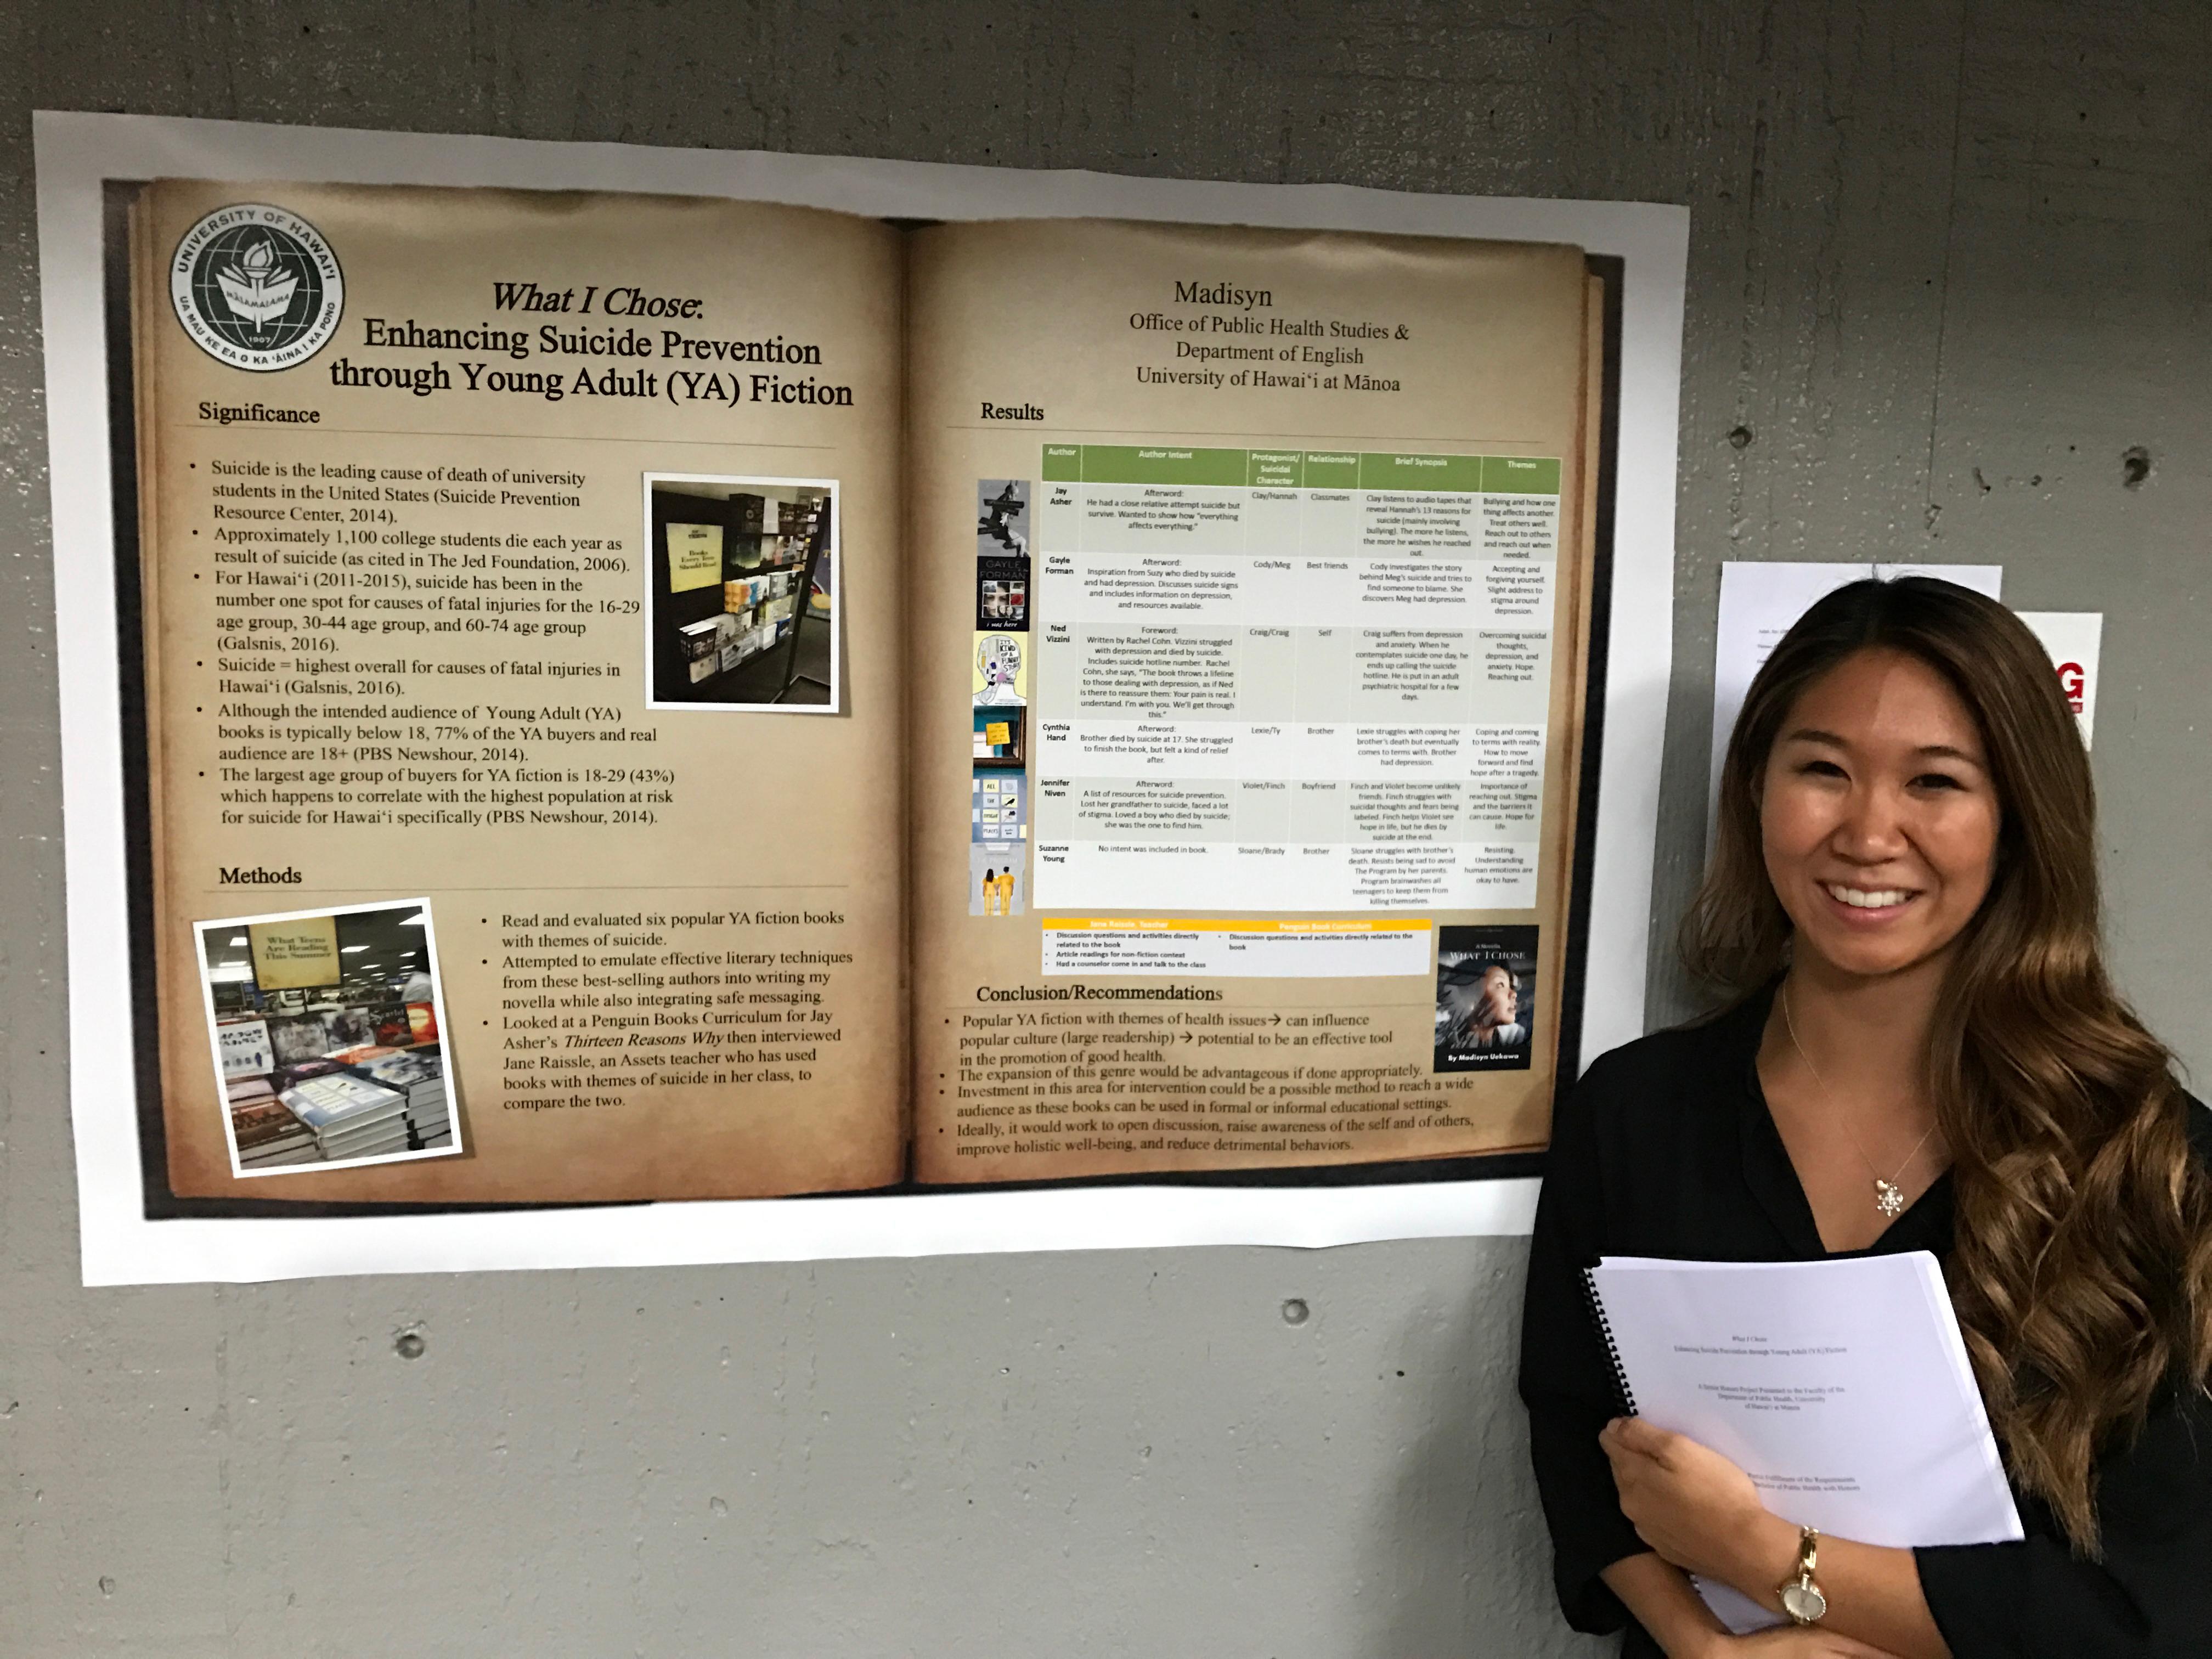 Dissertation proposal on public health